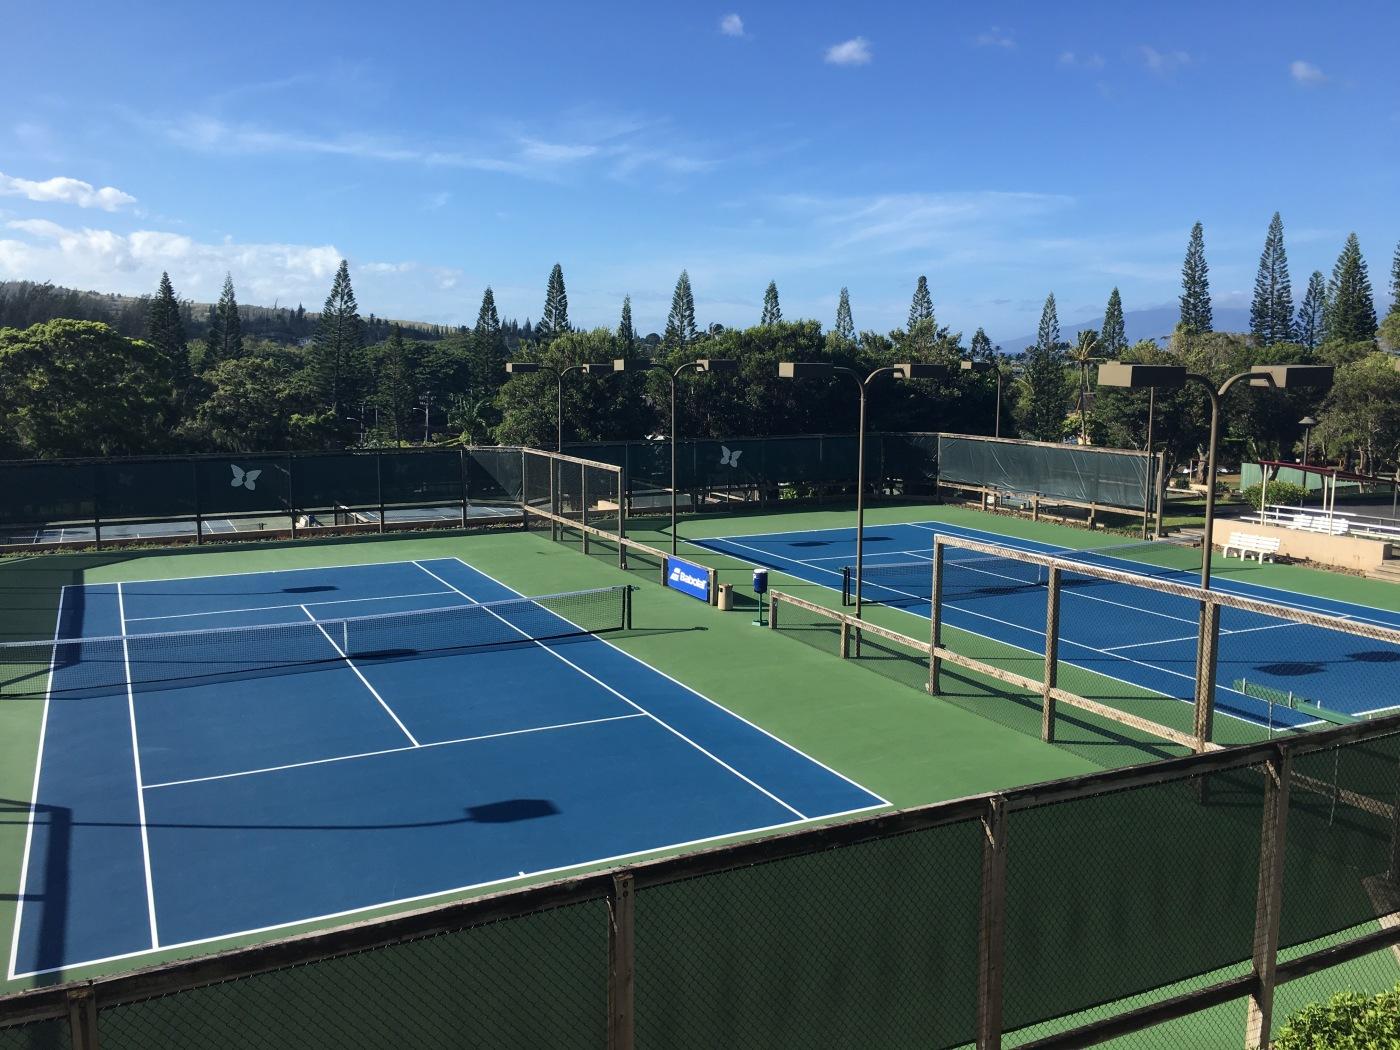 Kapalua Tennis Garden, Kapalua, Maui, Hawaii